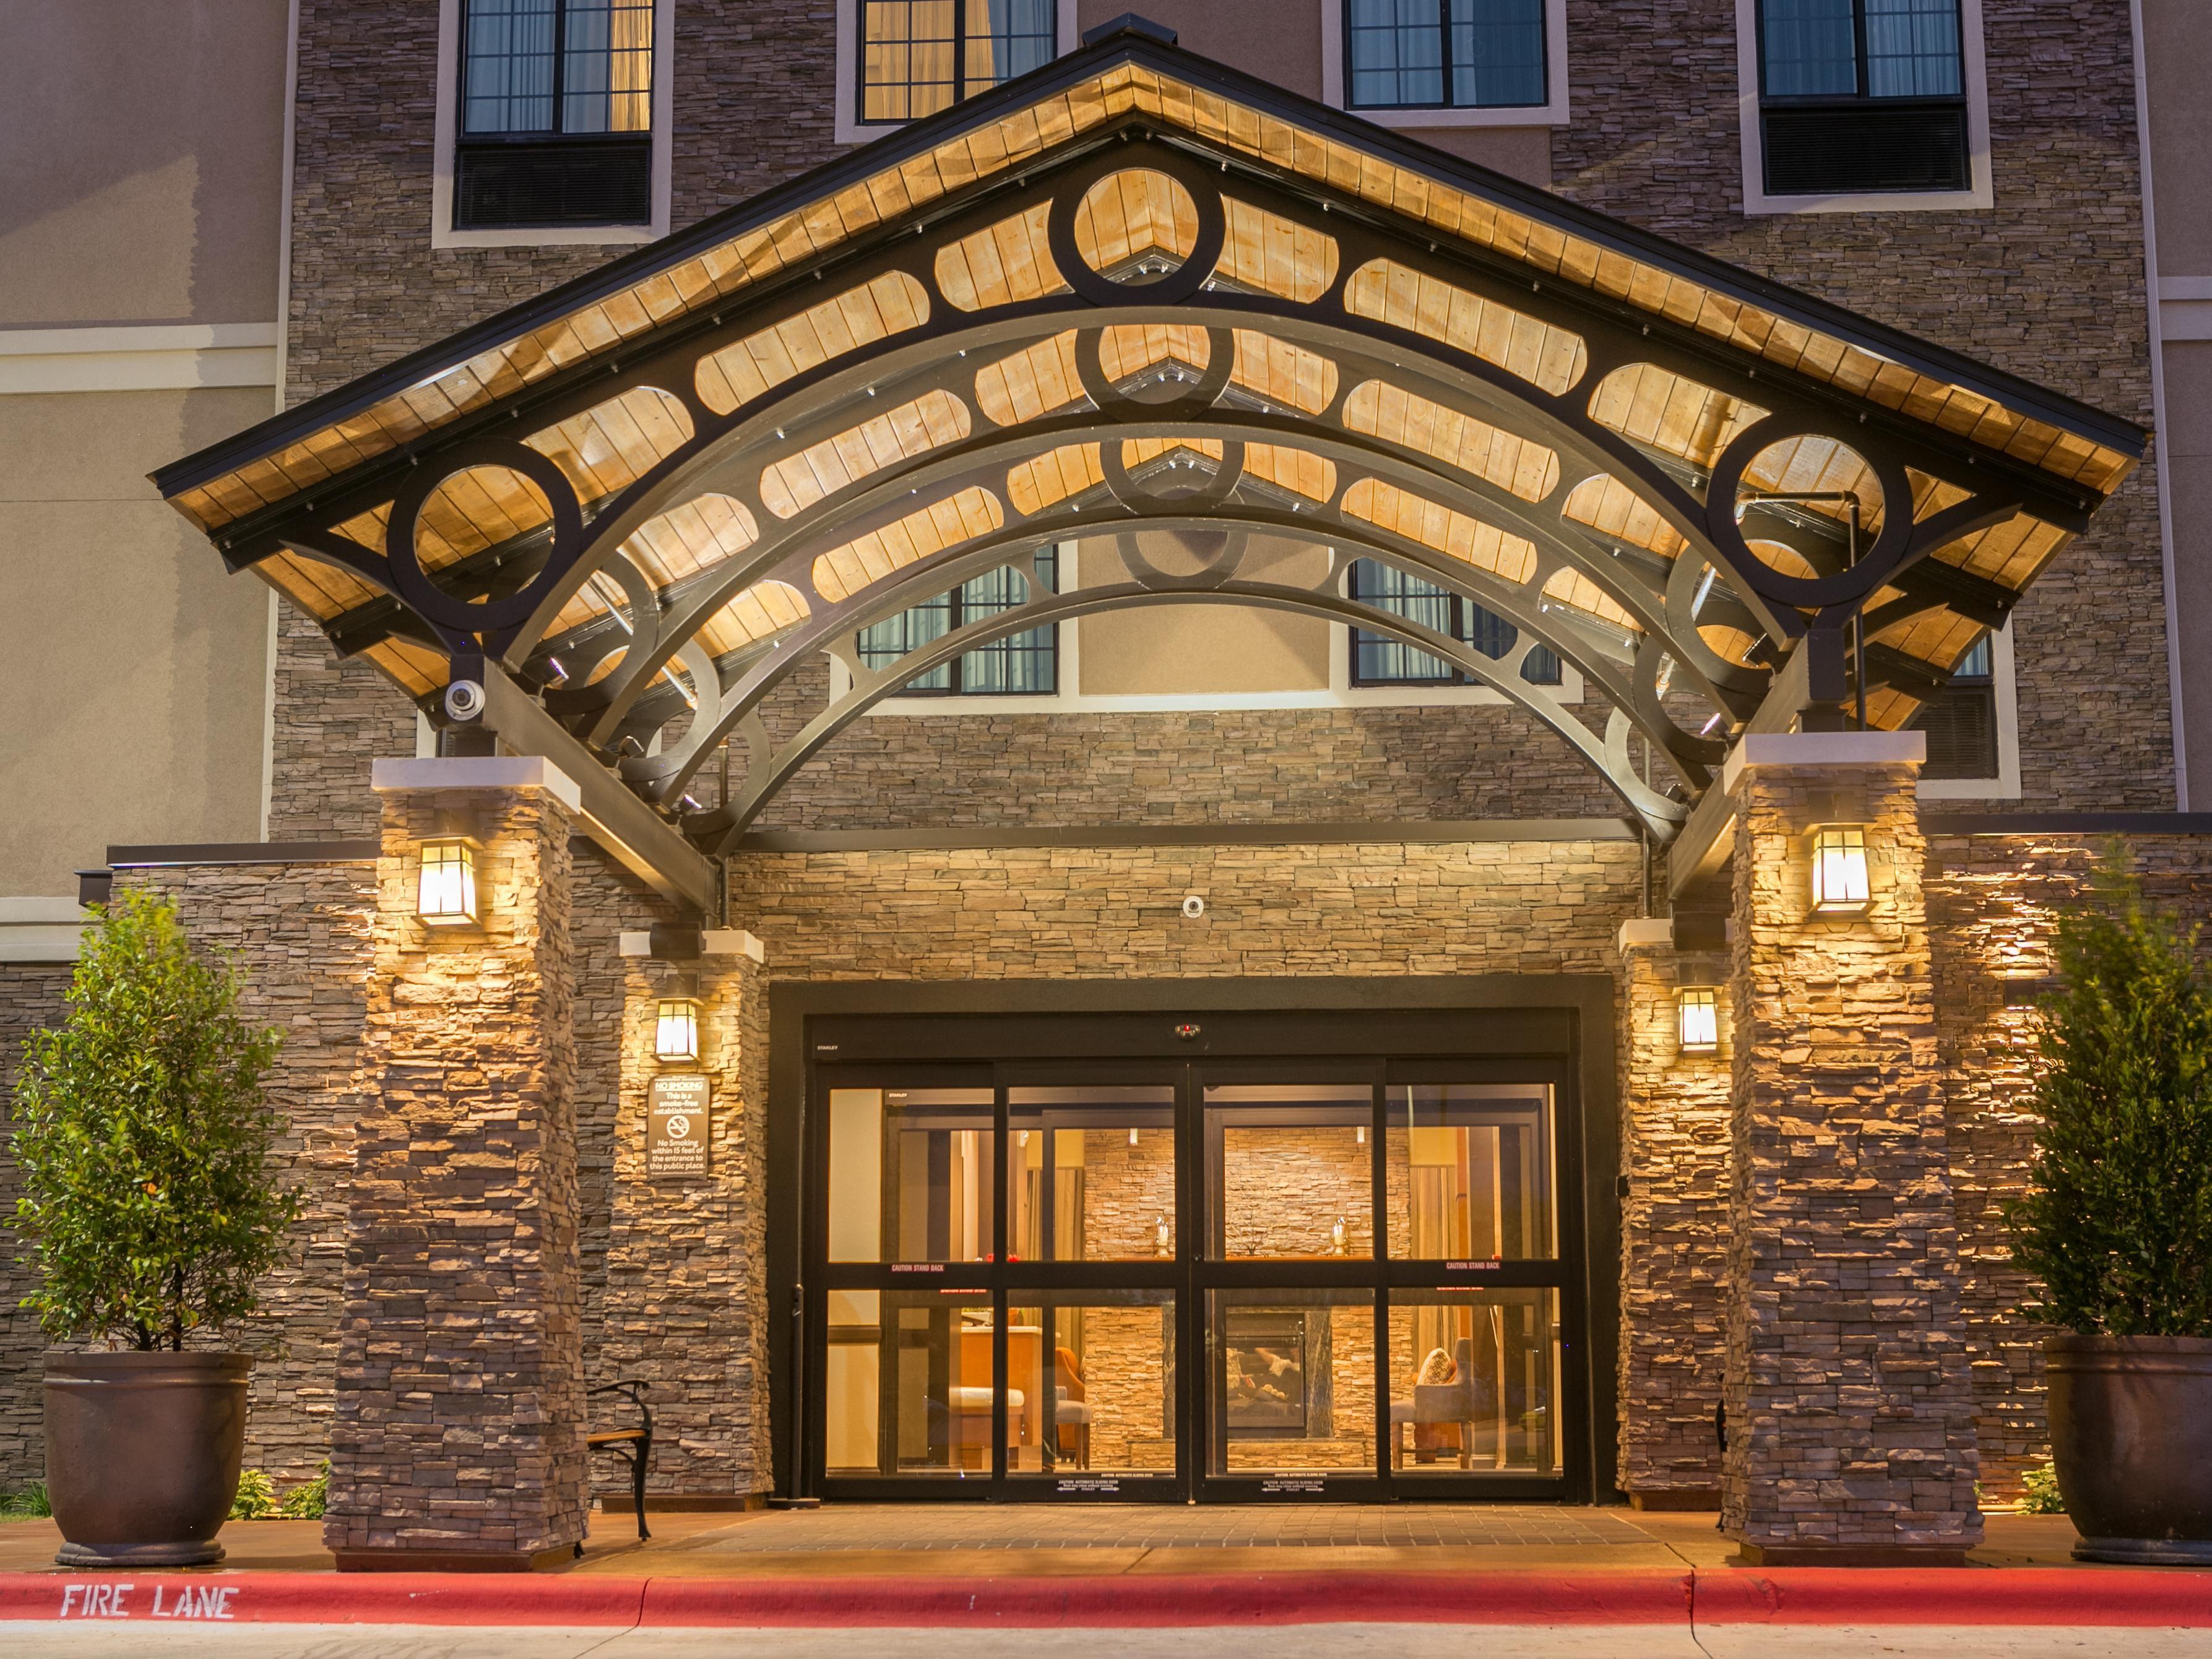 Austin North/Parmer Lane Hotel - Staybridge Suites Extended Stay ...